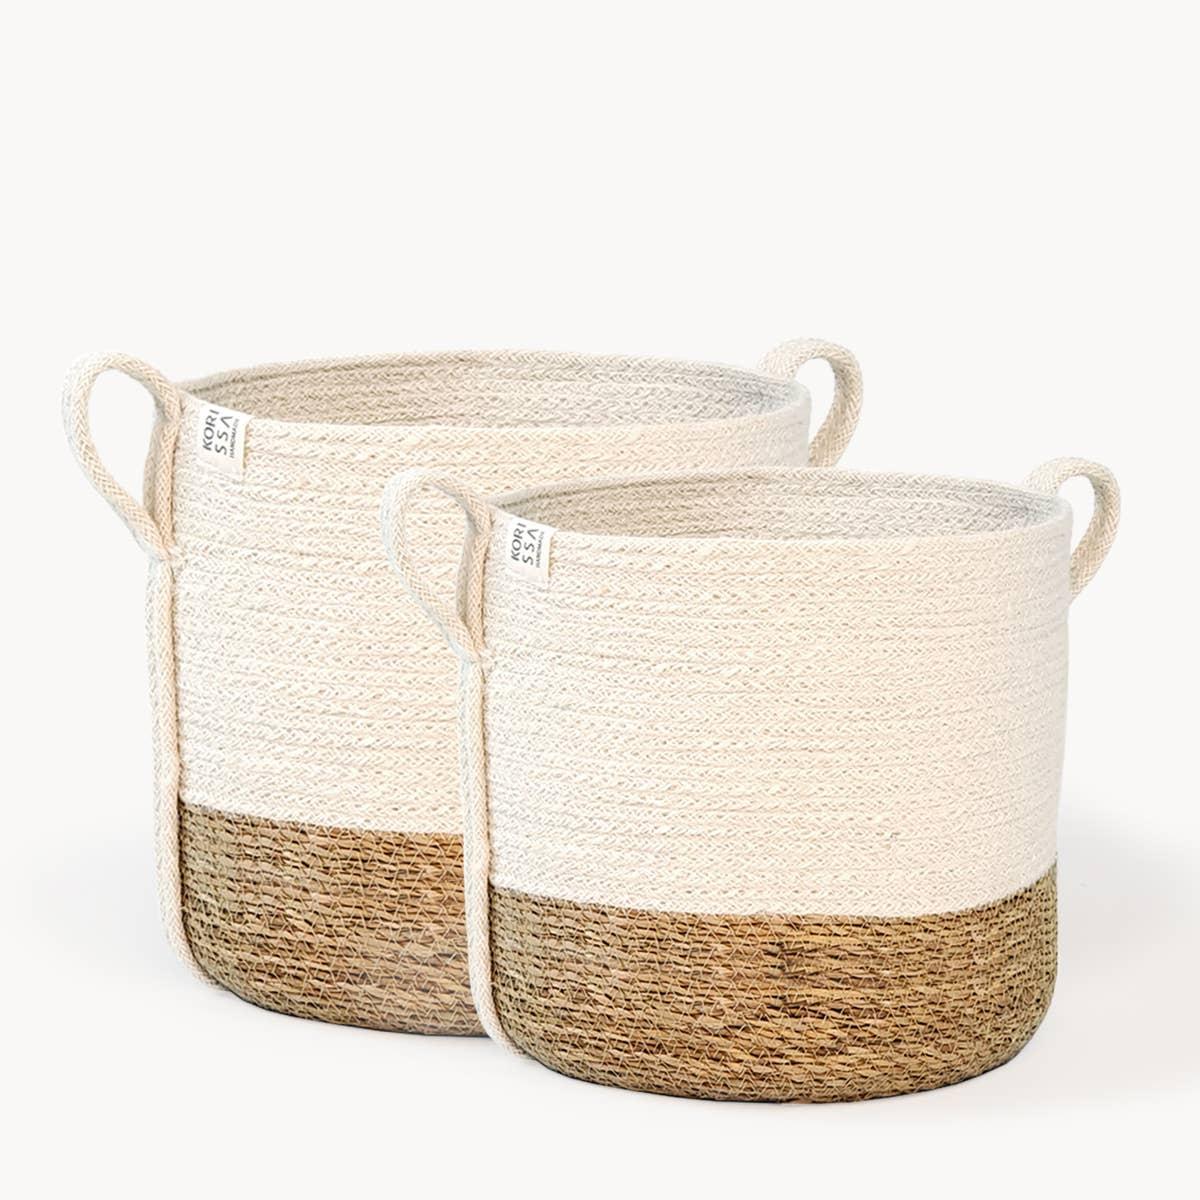 Savar Basket with Side handle (Set of 2) | Trada Marketplace